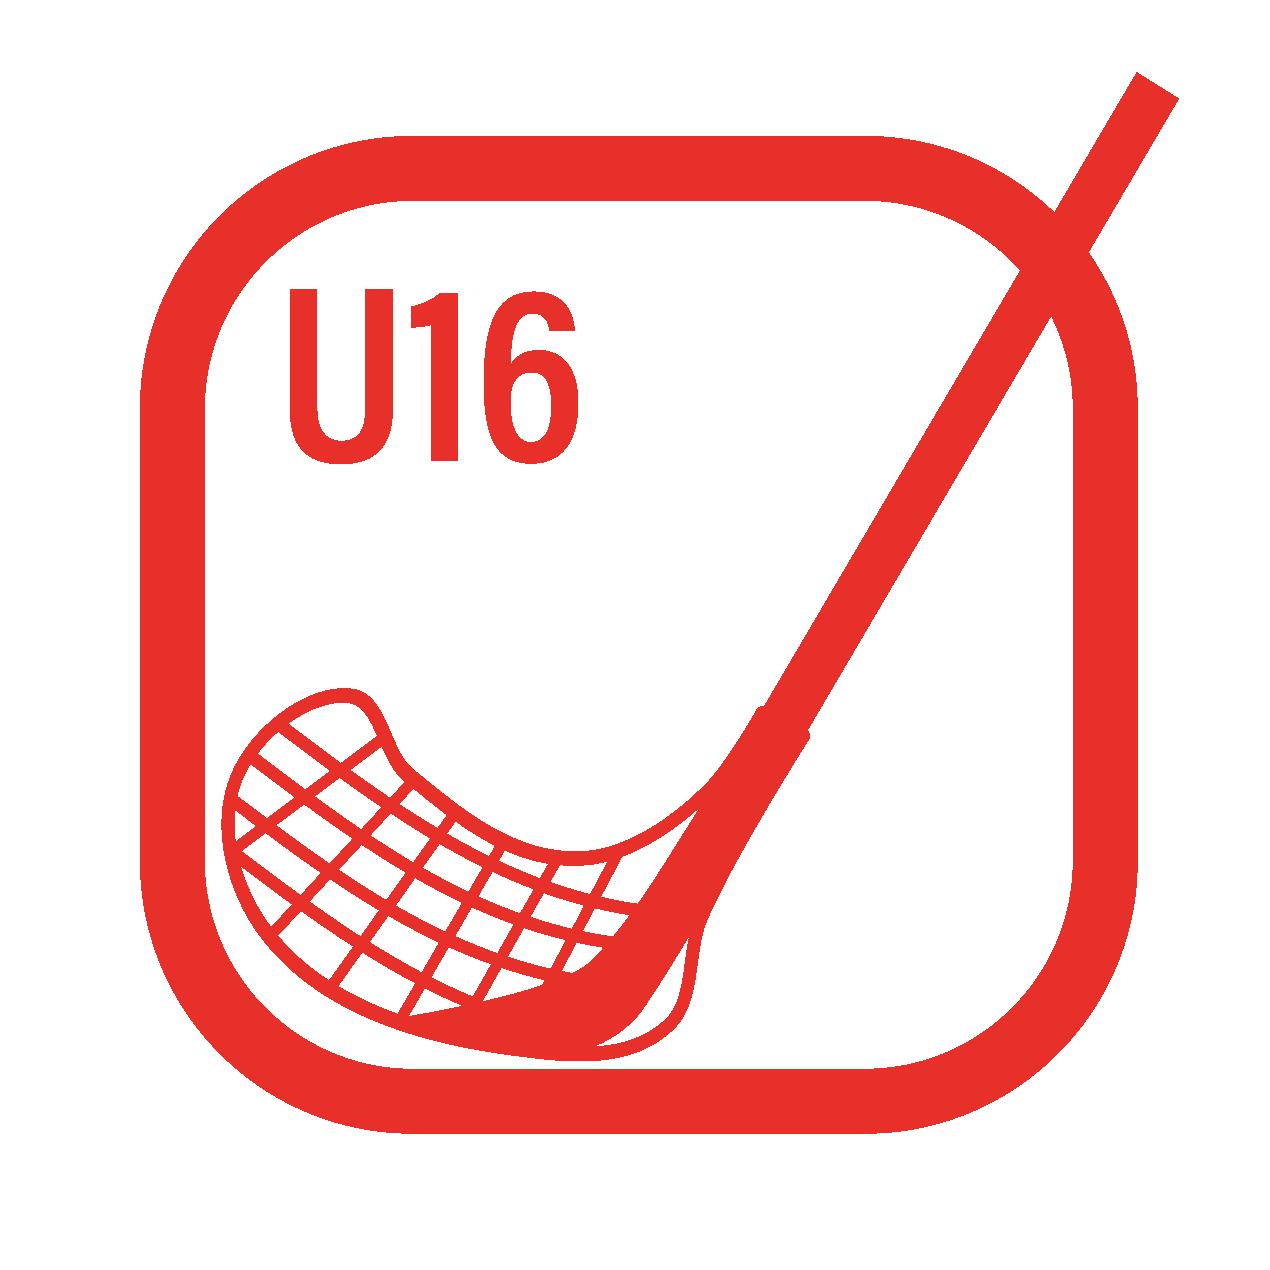 Unihockey U16